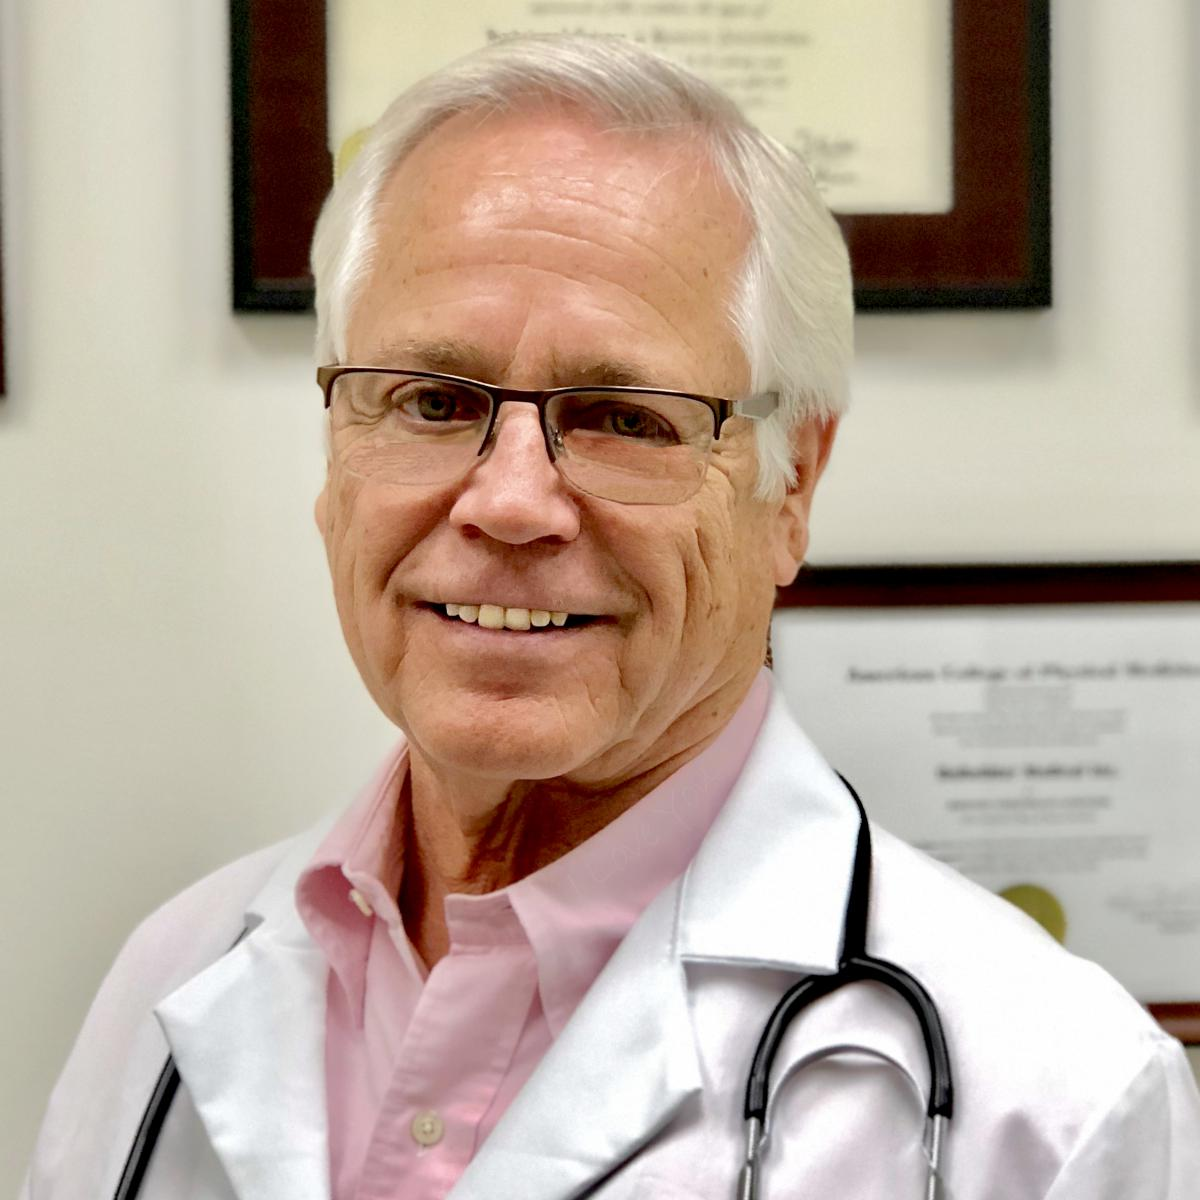 David B Phillips MD PhD - Inventor of the ReBuilder